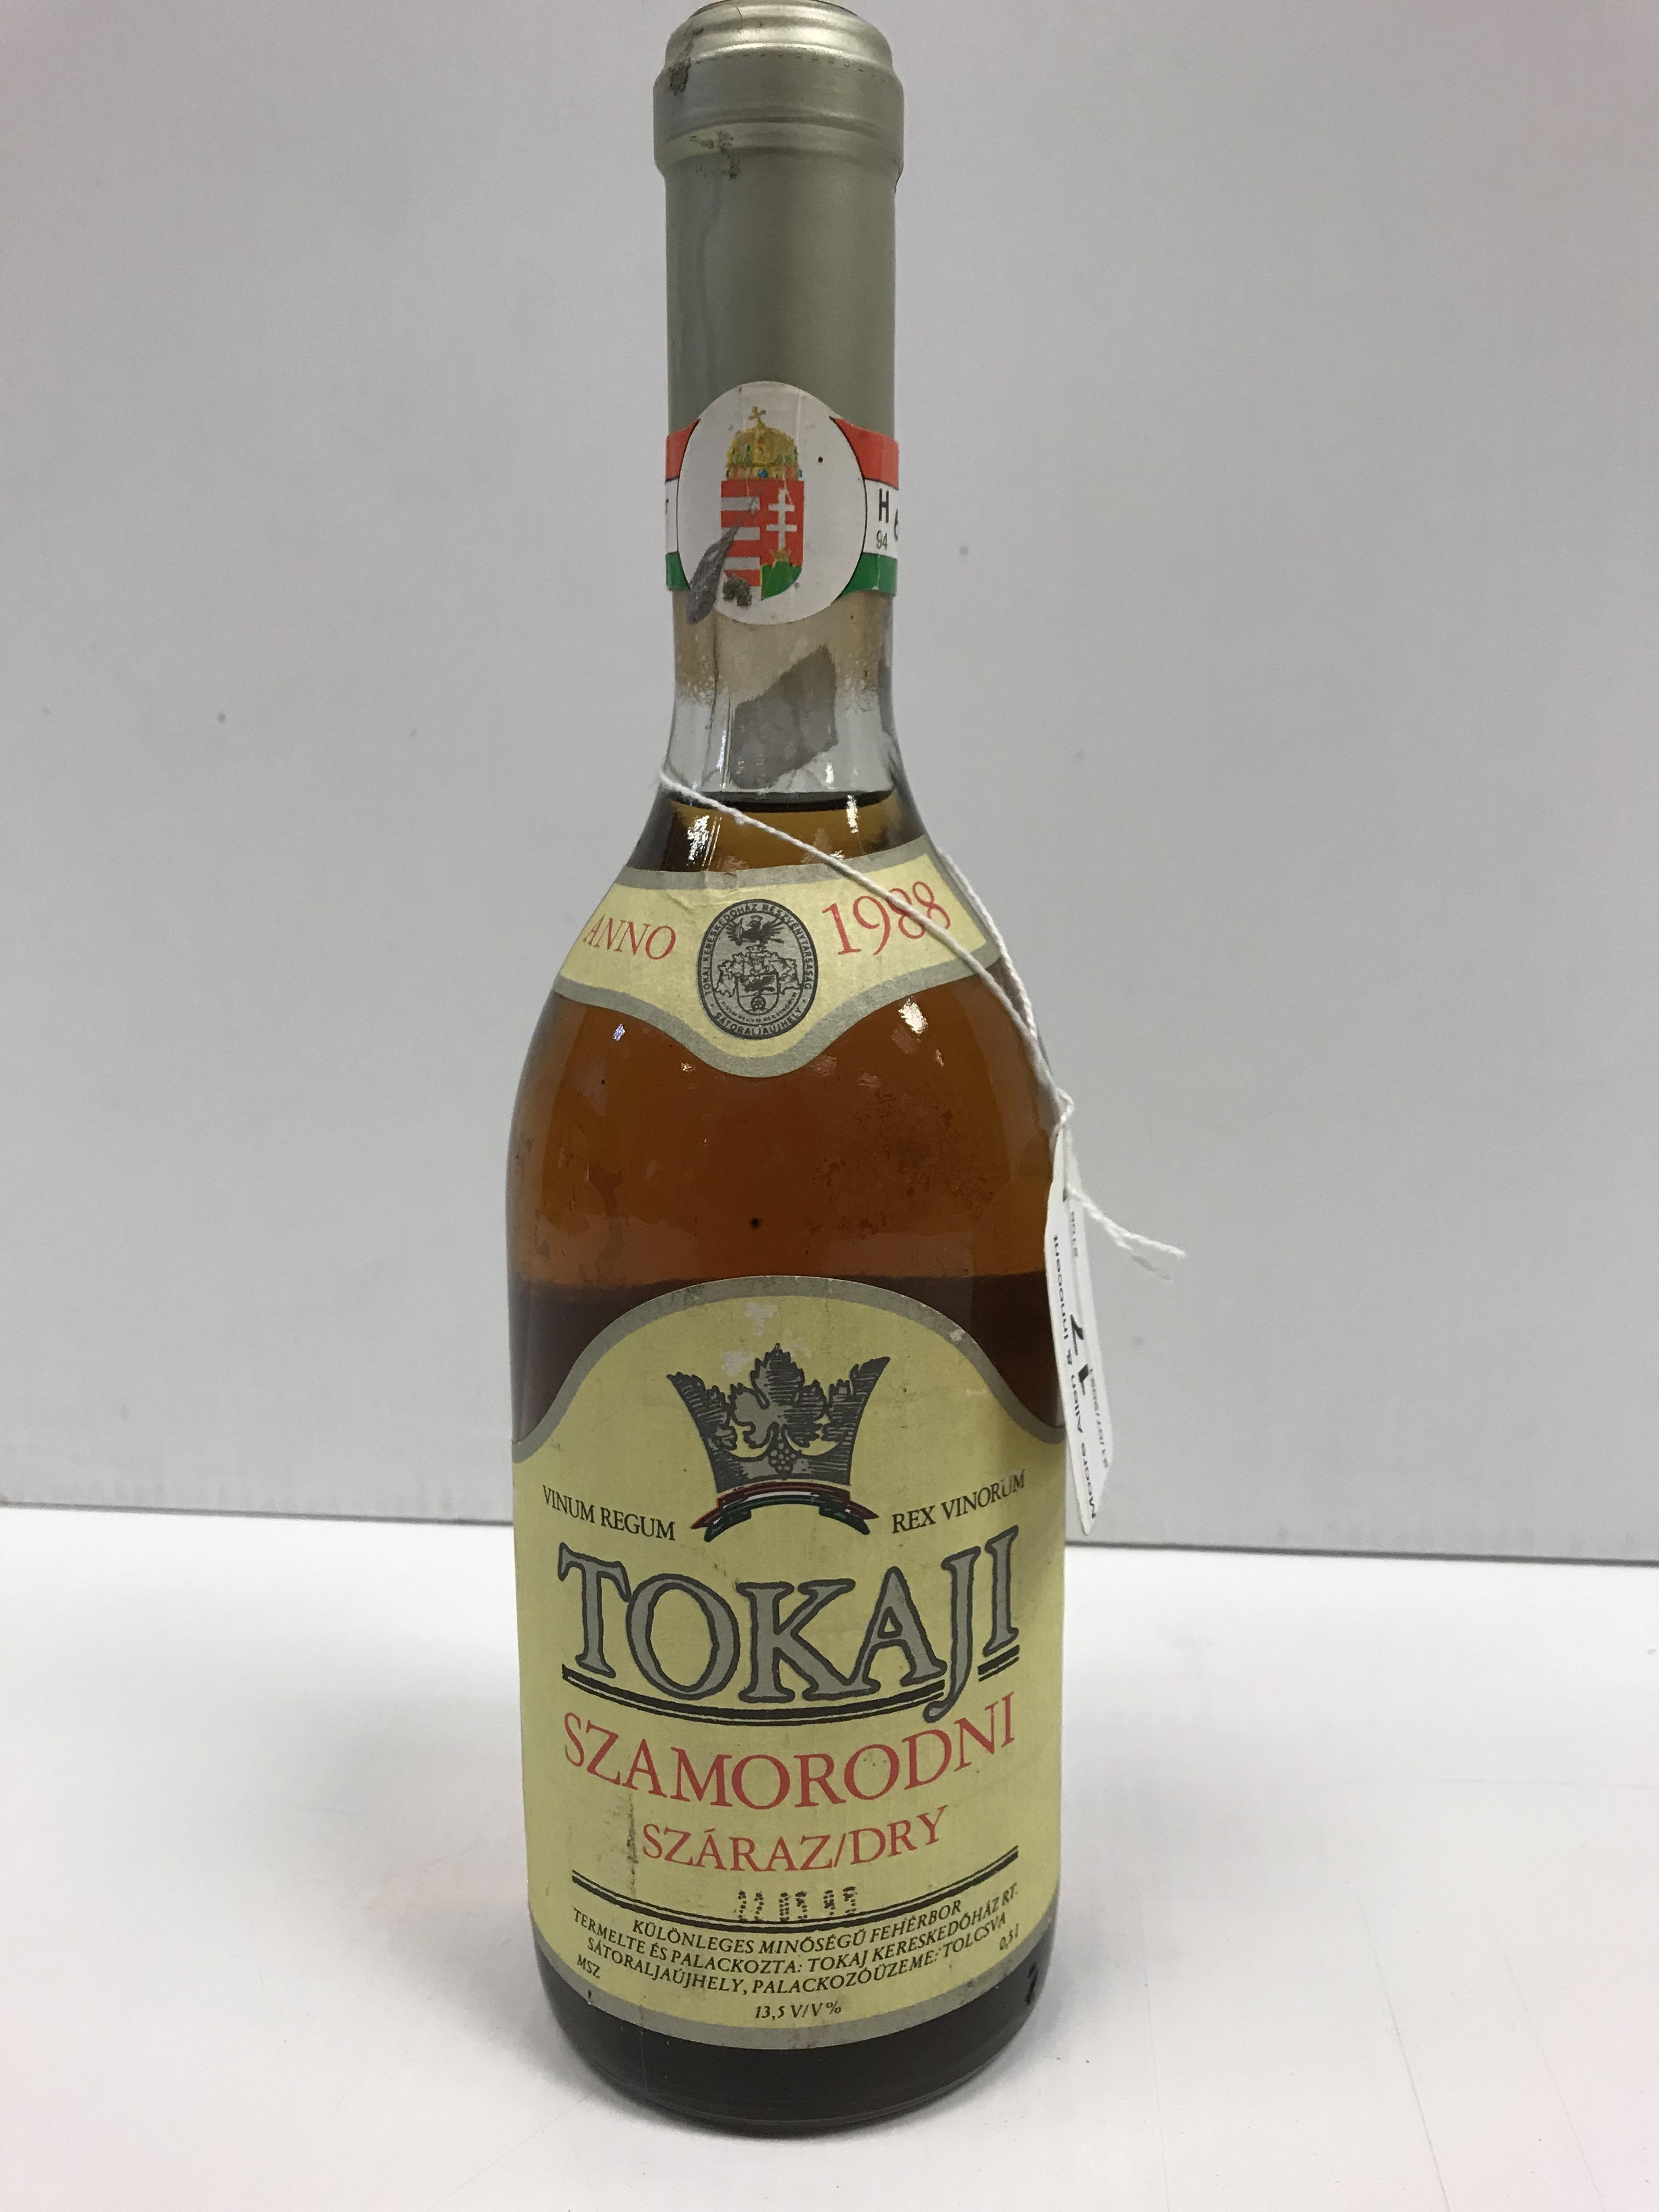 Tokaaji Szamorodni Száraz 1988 x 0.5 l bottle